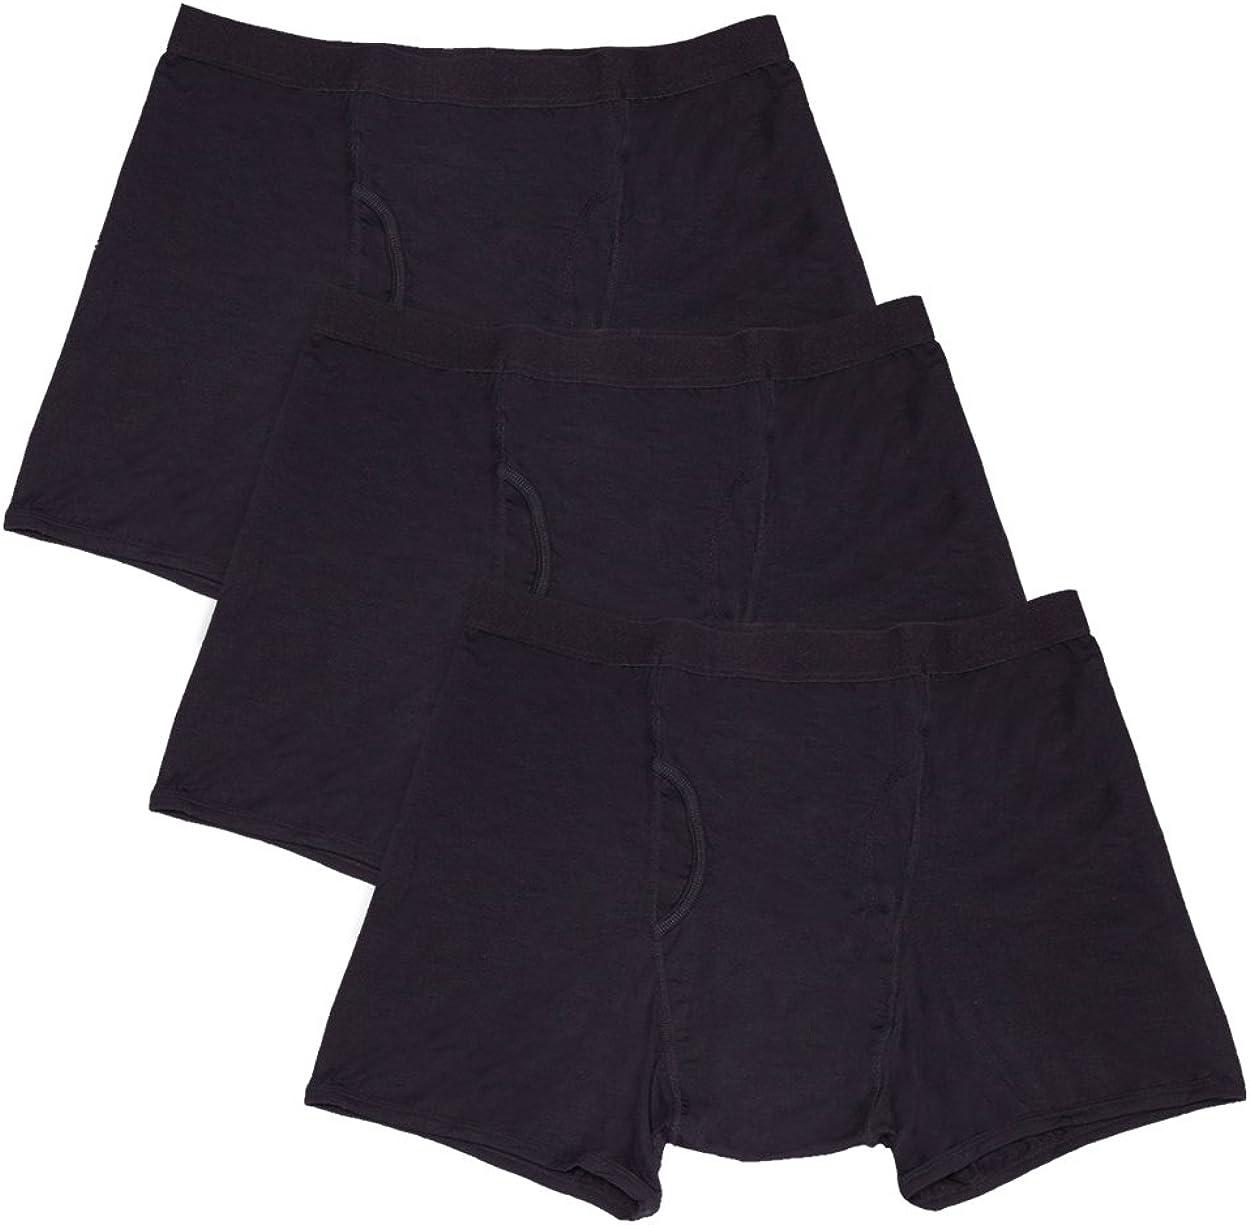 iHeartRaves Hide Your Stash Boxer Briefs, Men's Hidden Pocket Underwear